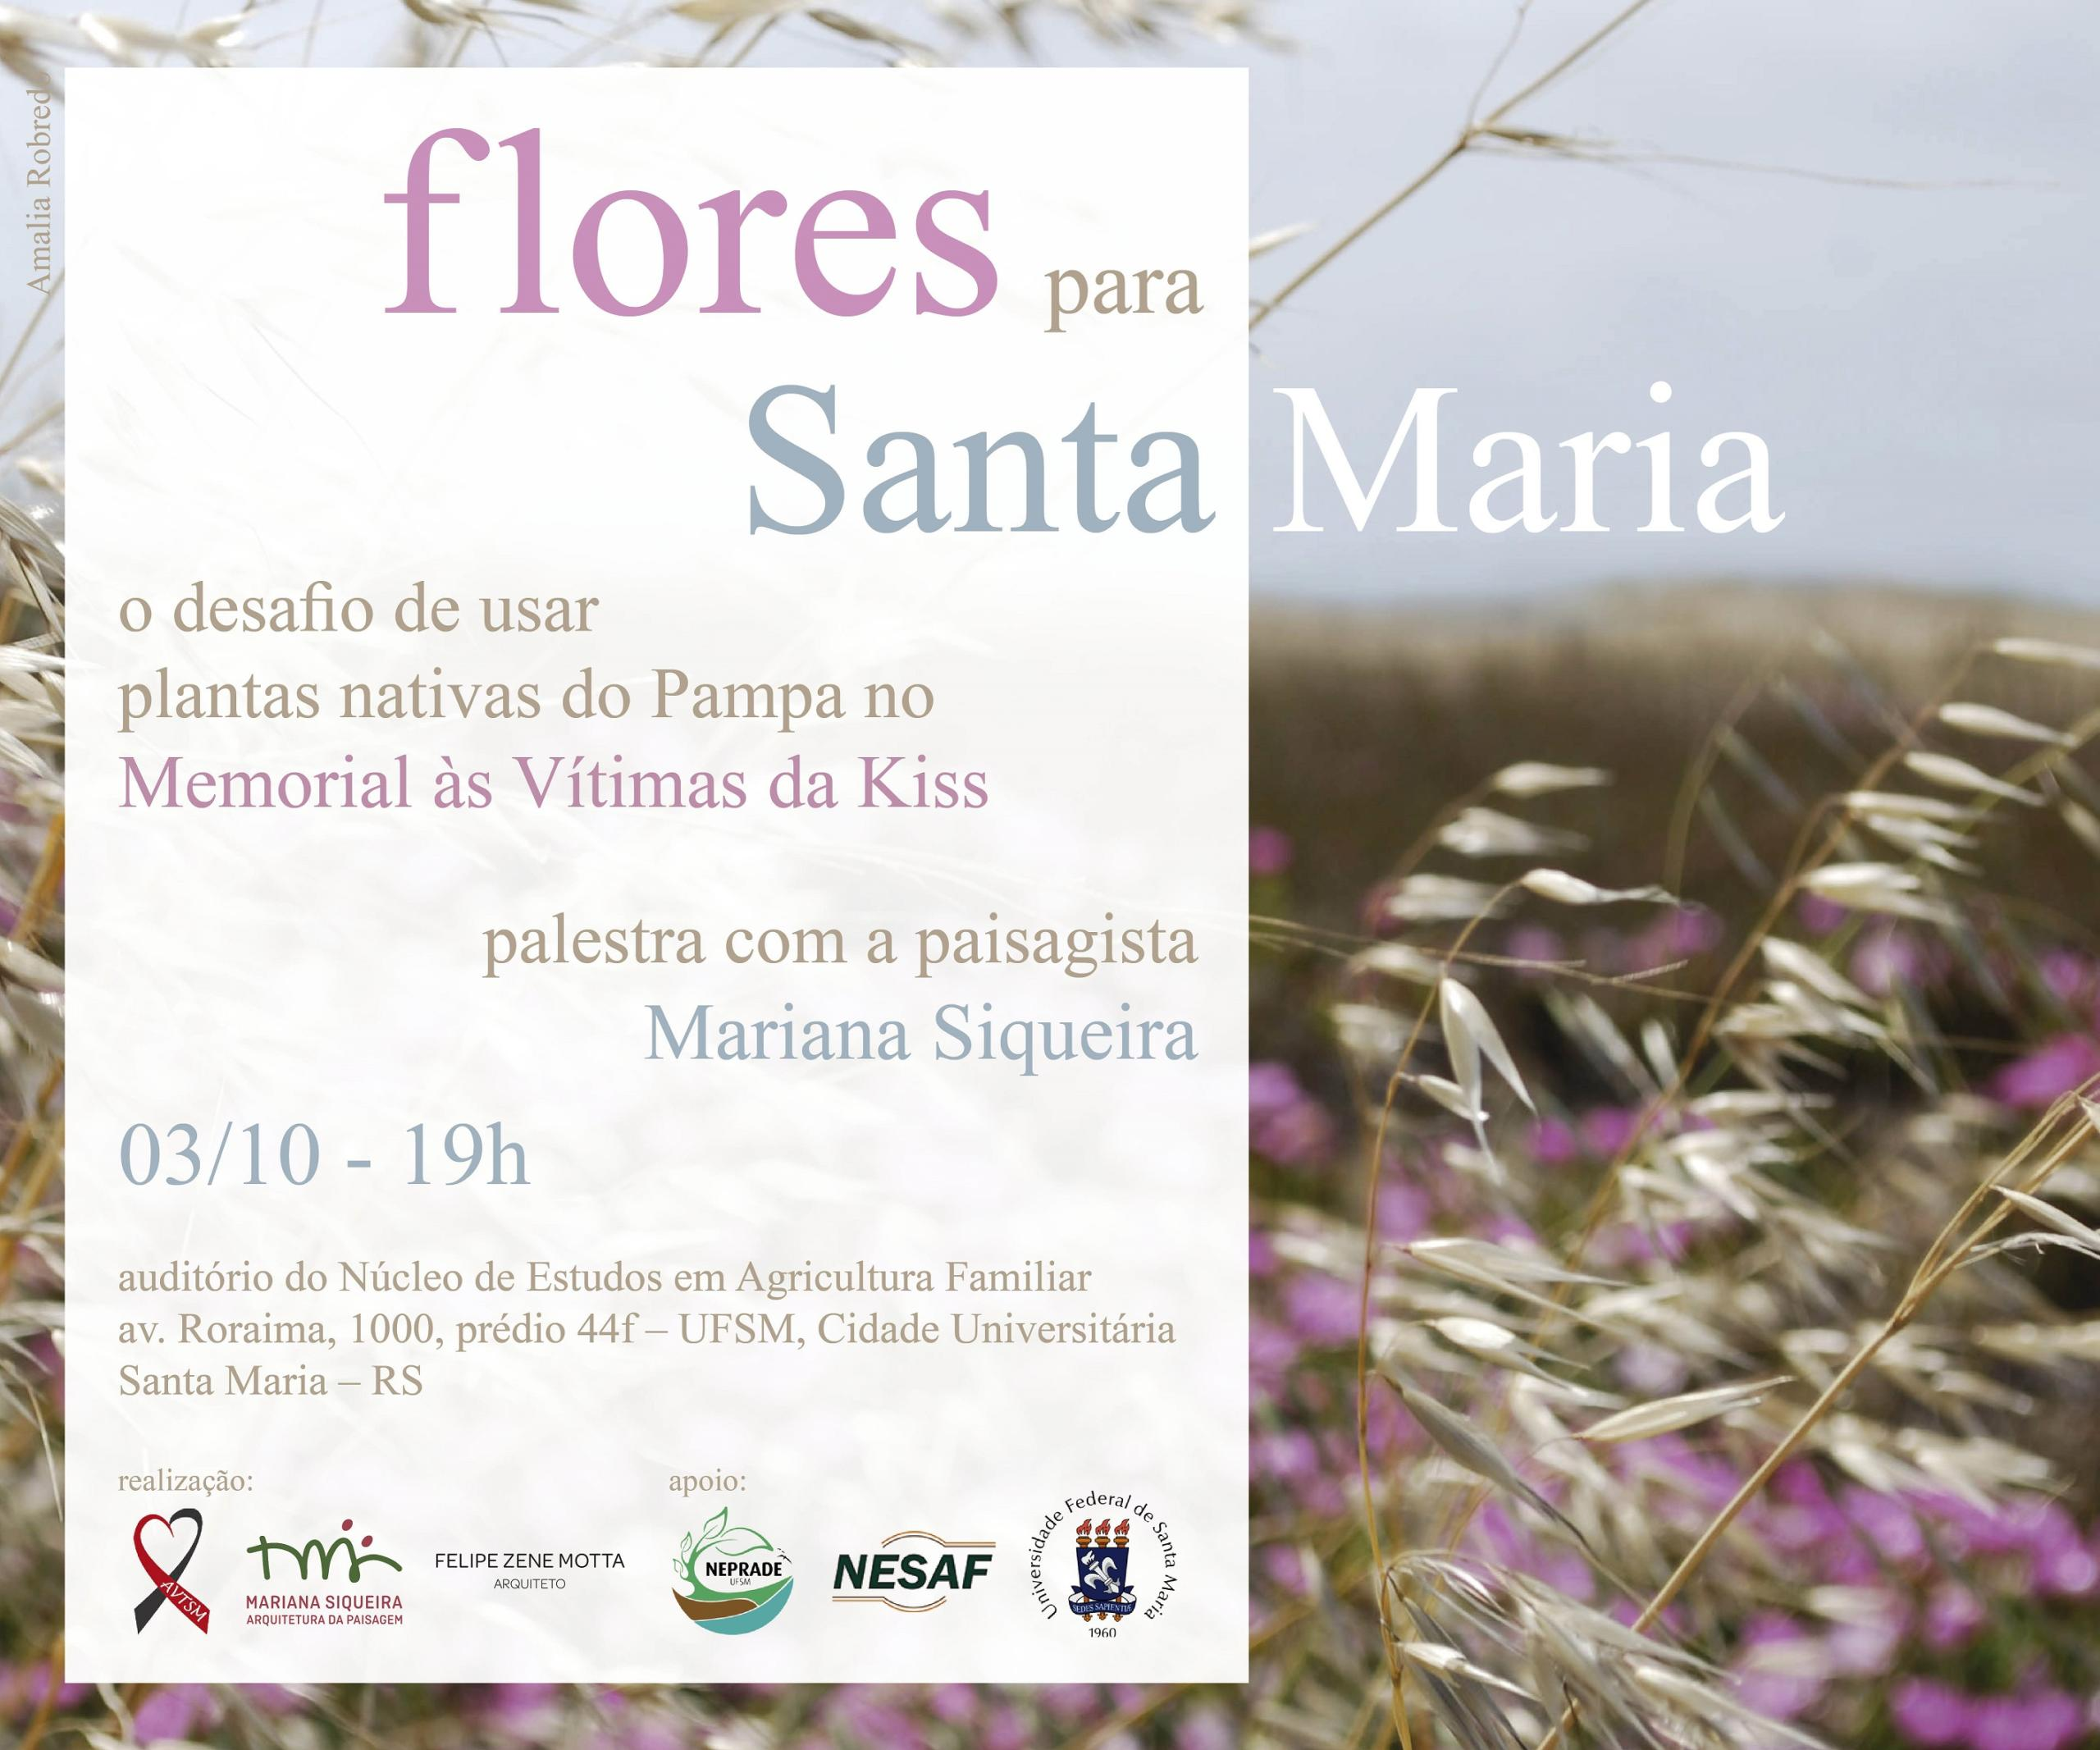 2018 10 03 Flores para Santa Maria 300dpi